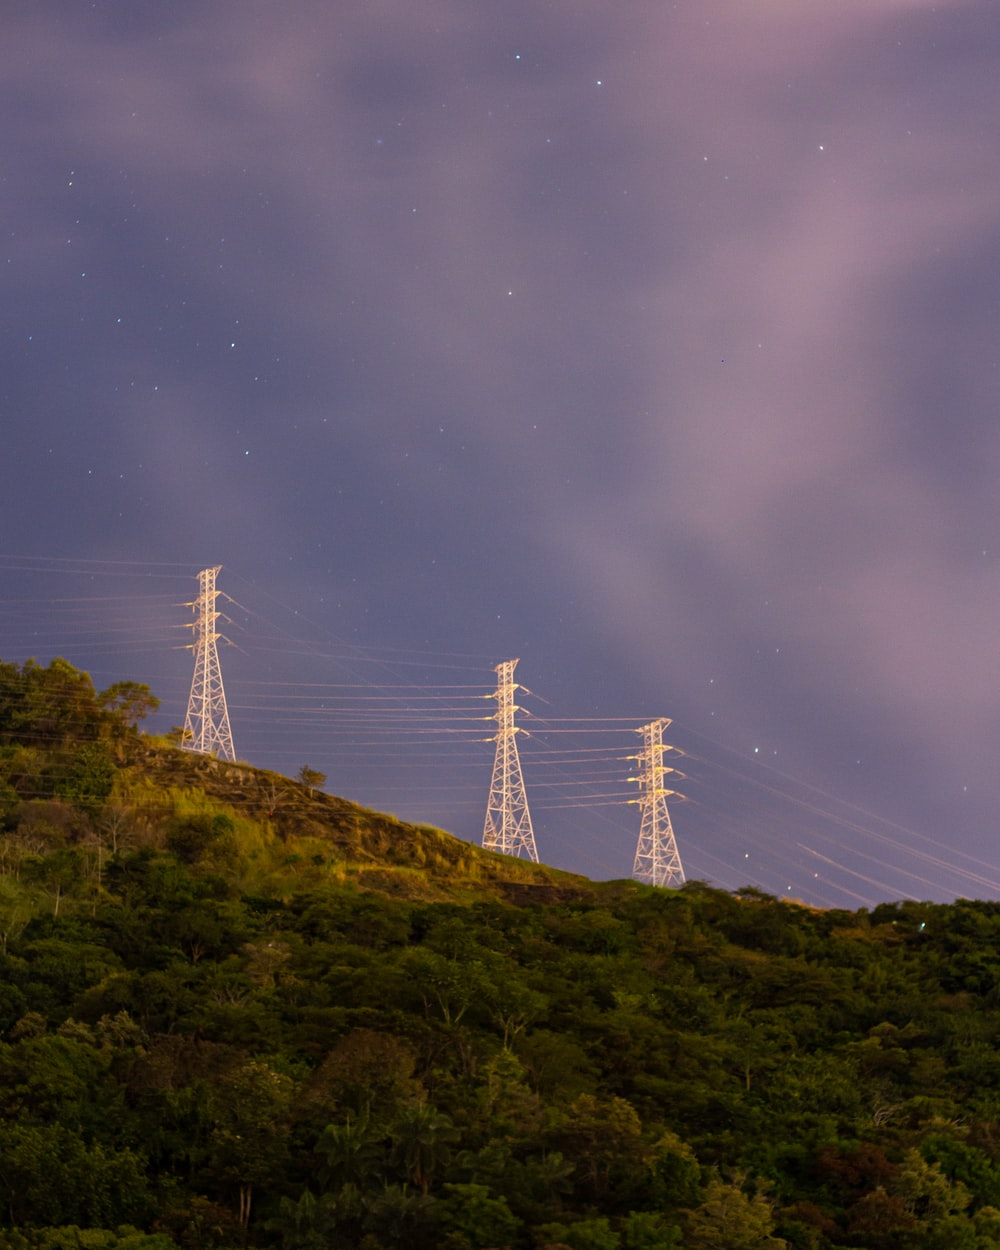 white steel bridge on top of green mountain during night time